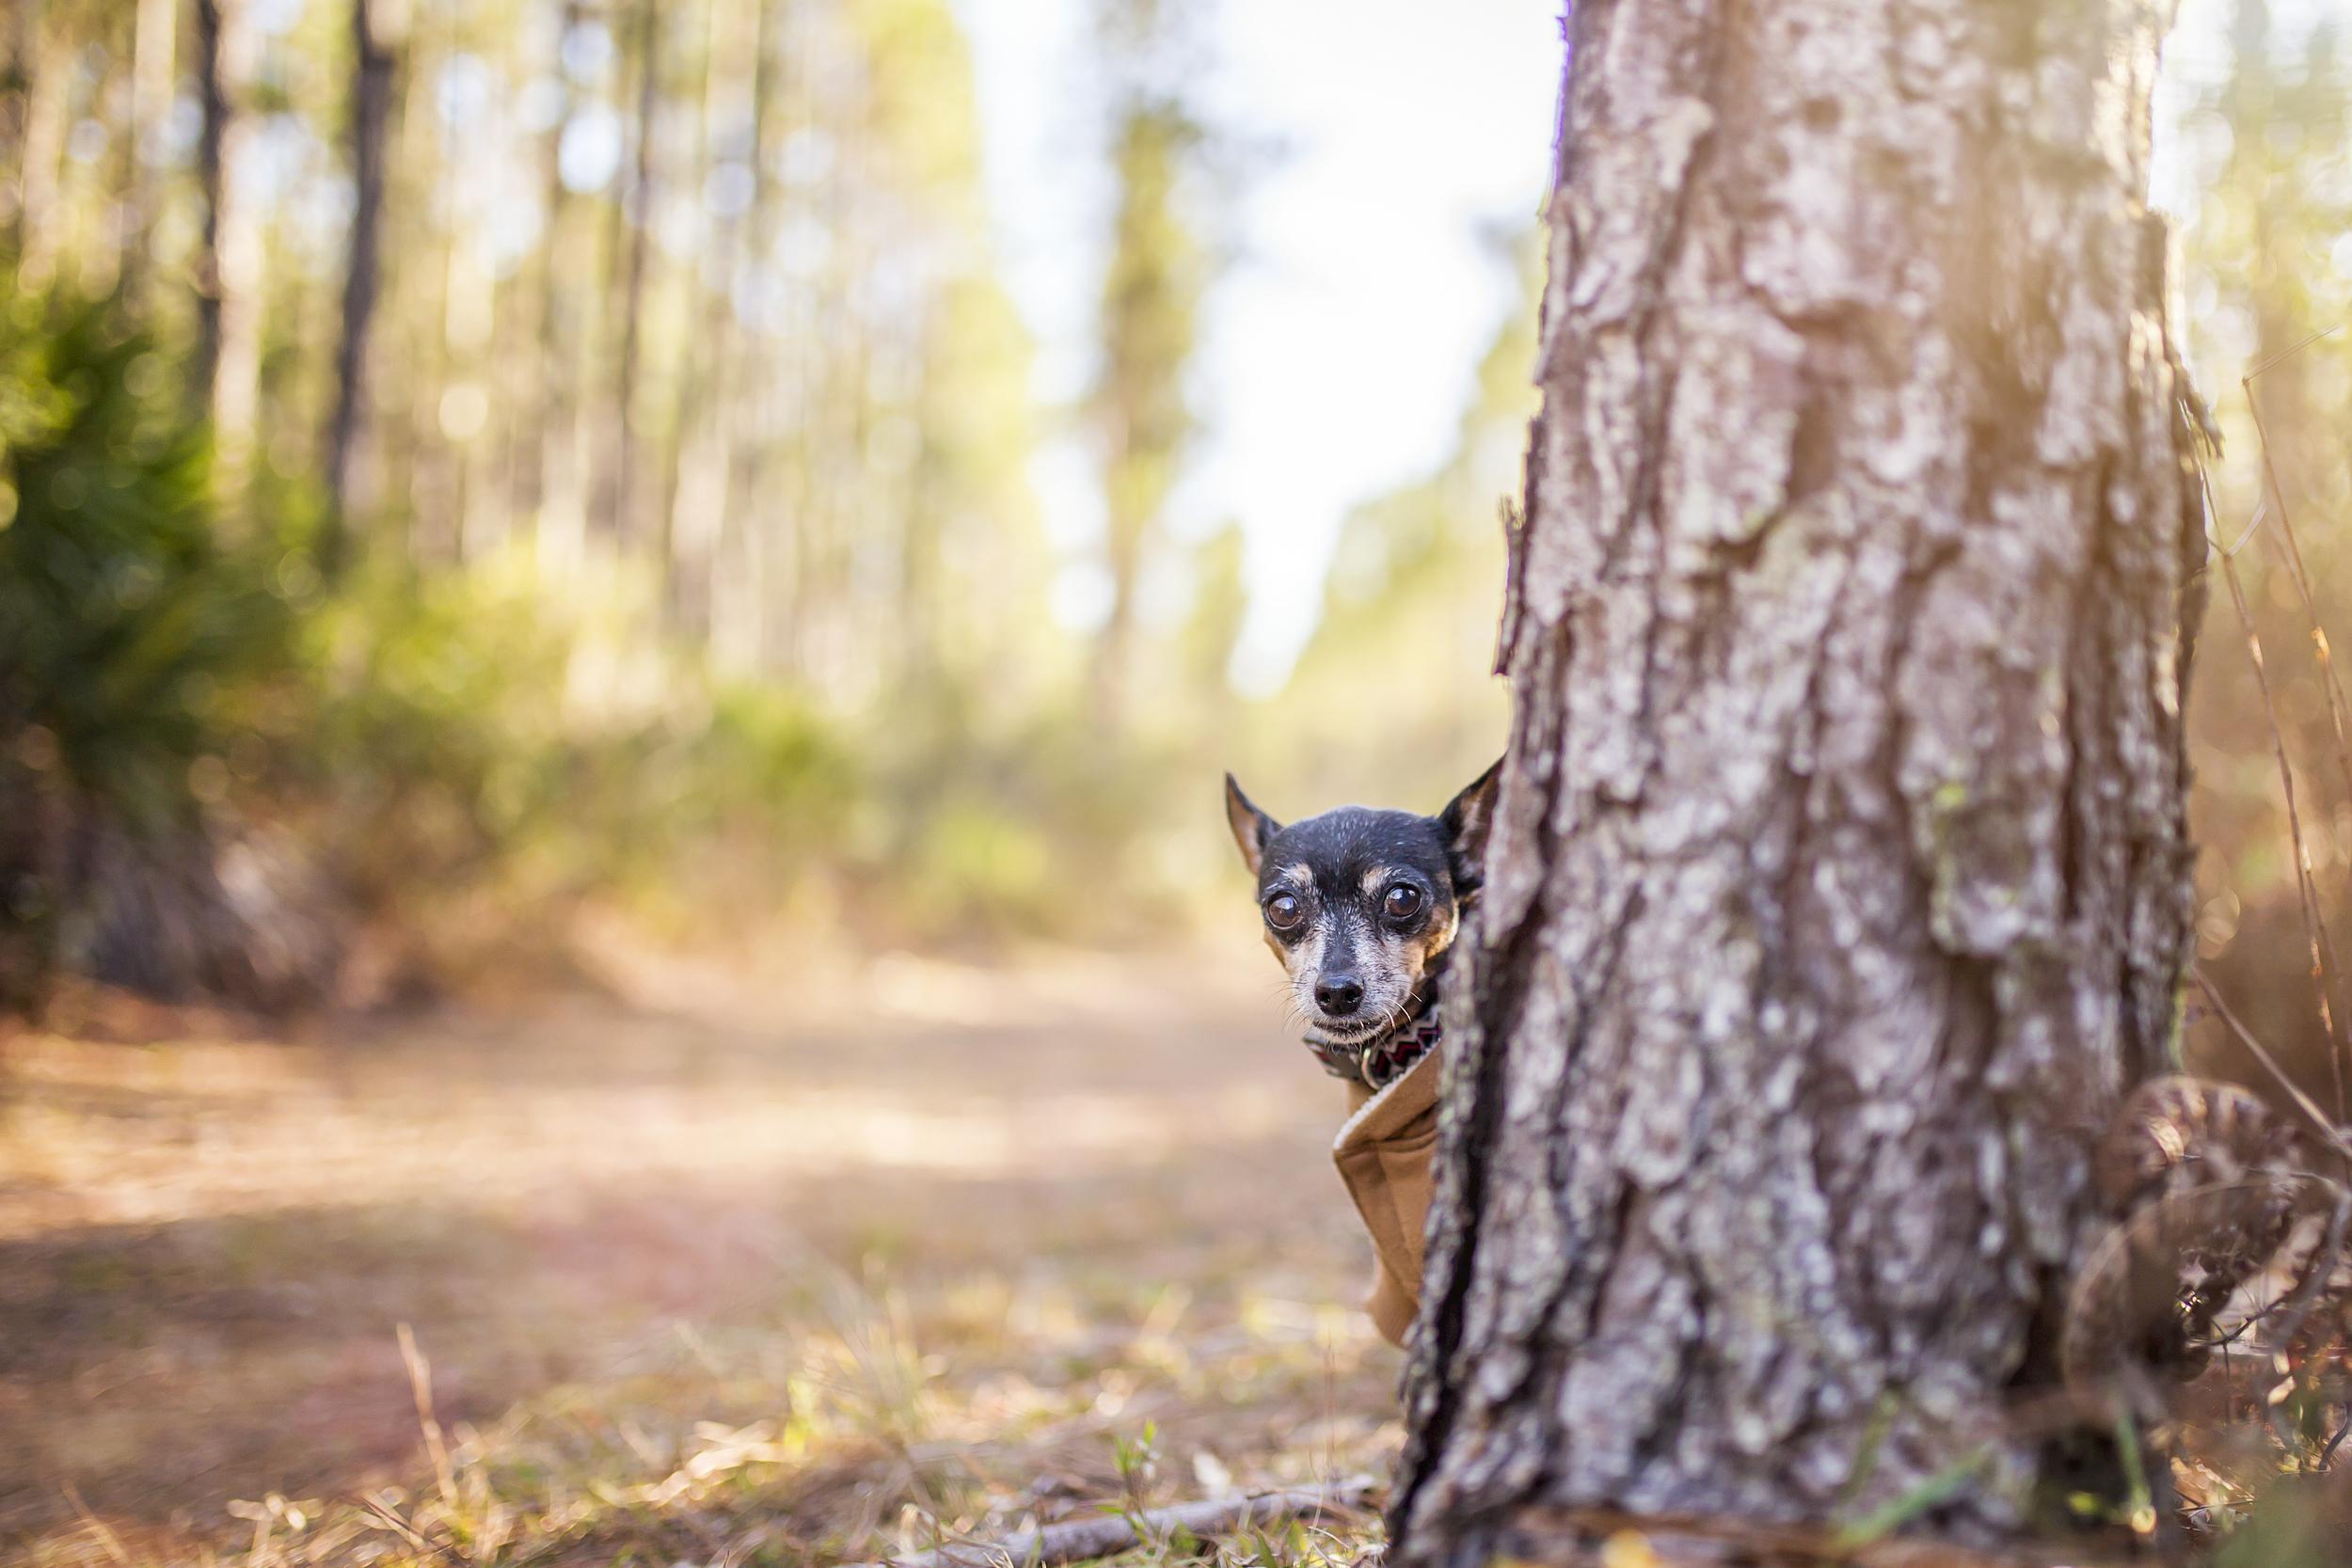 Kika peeking